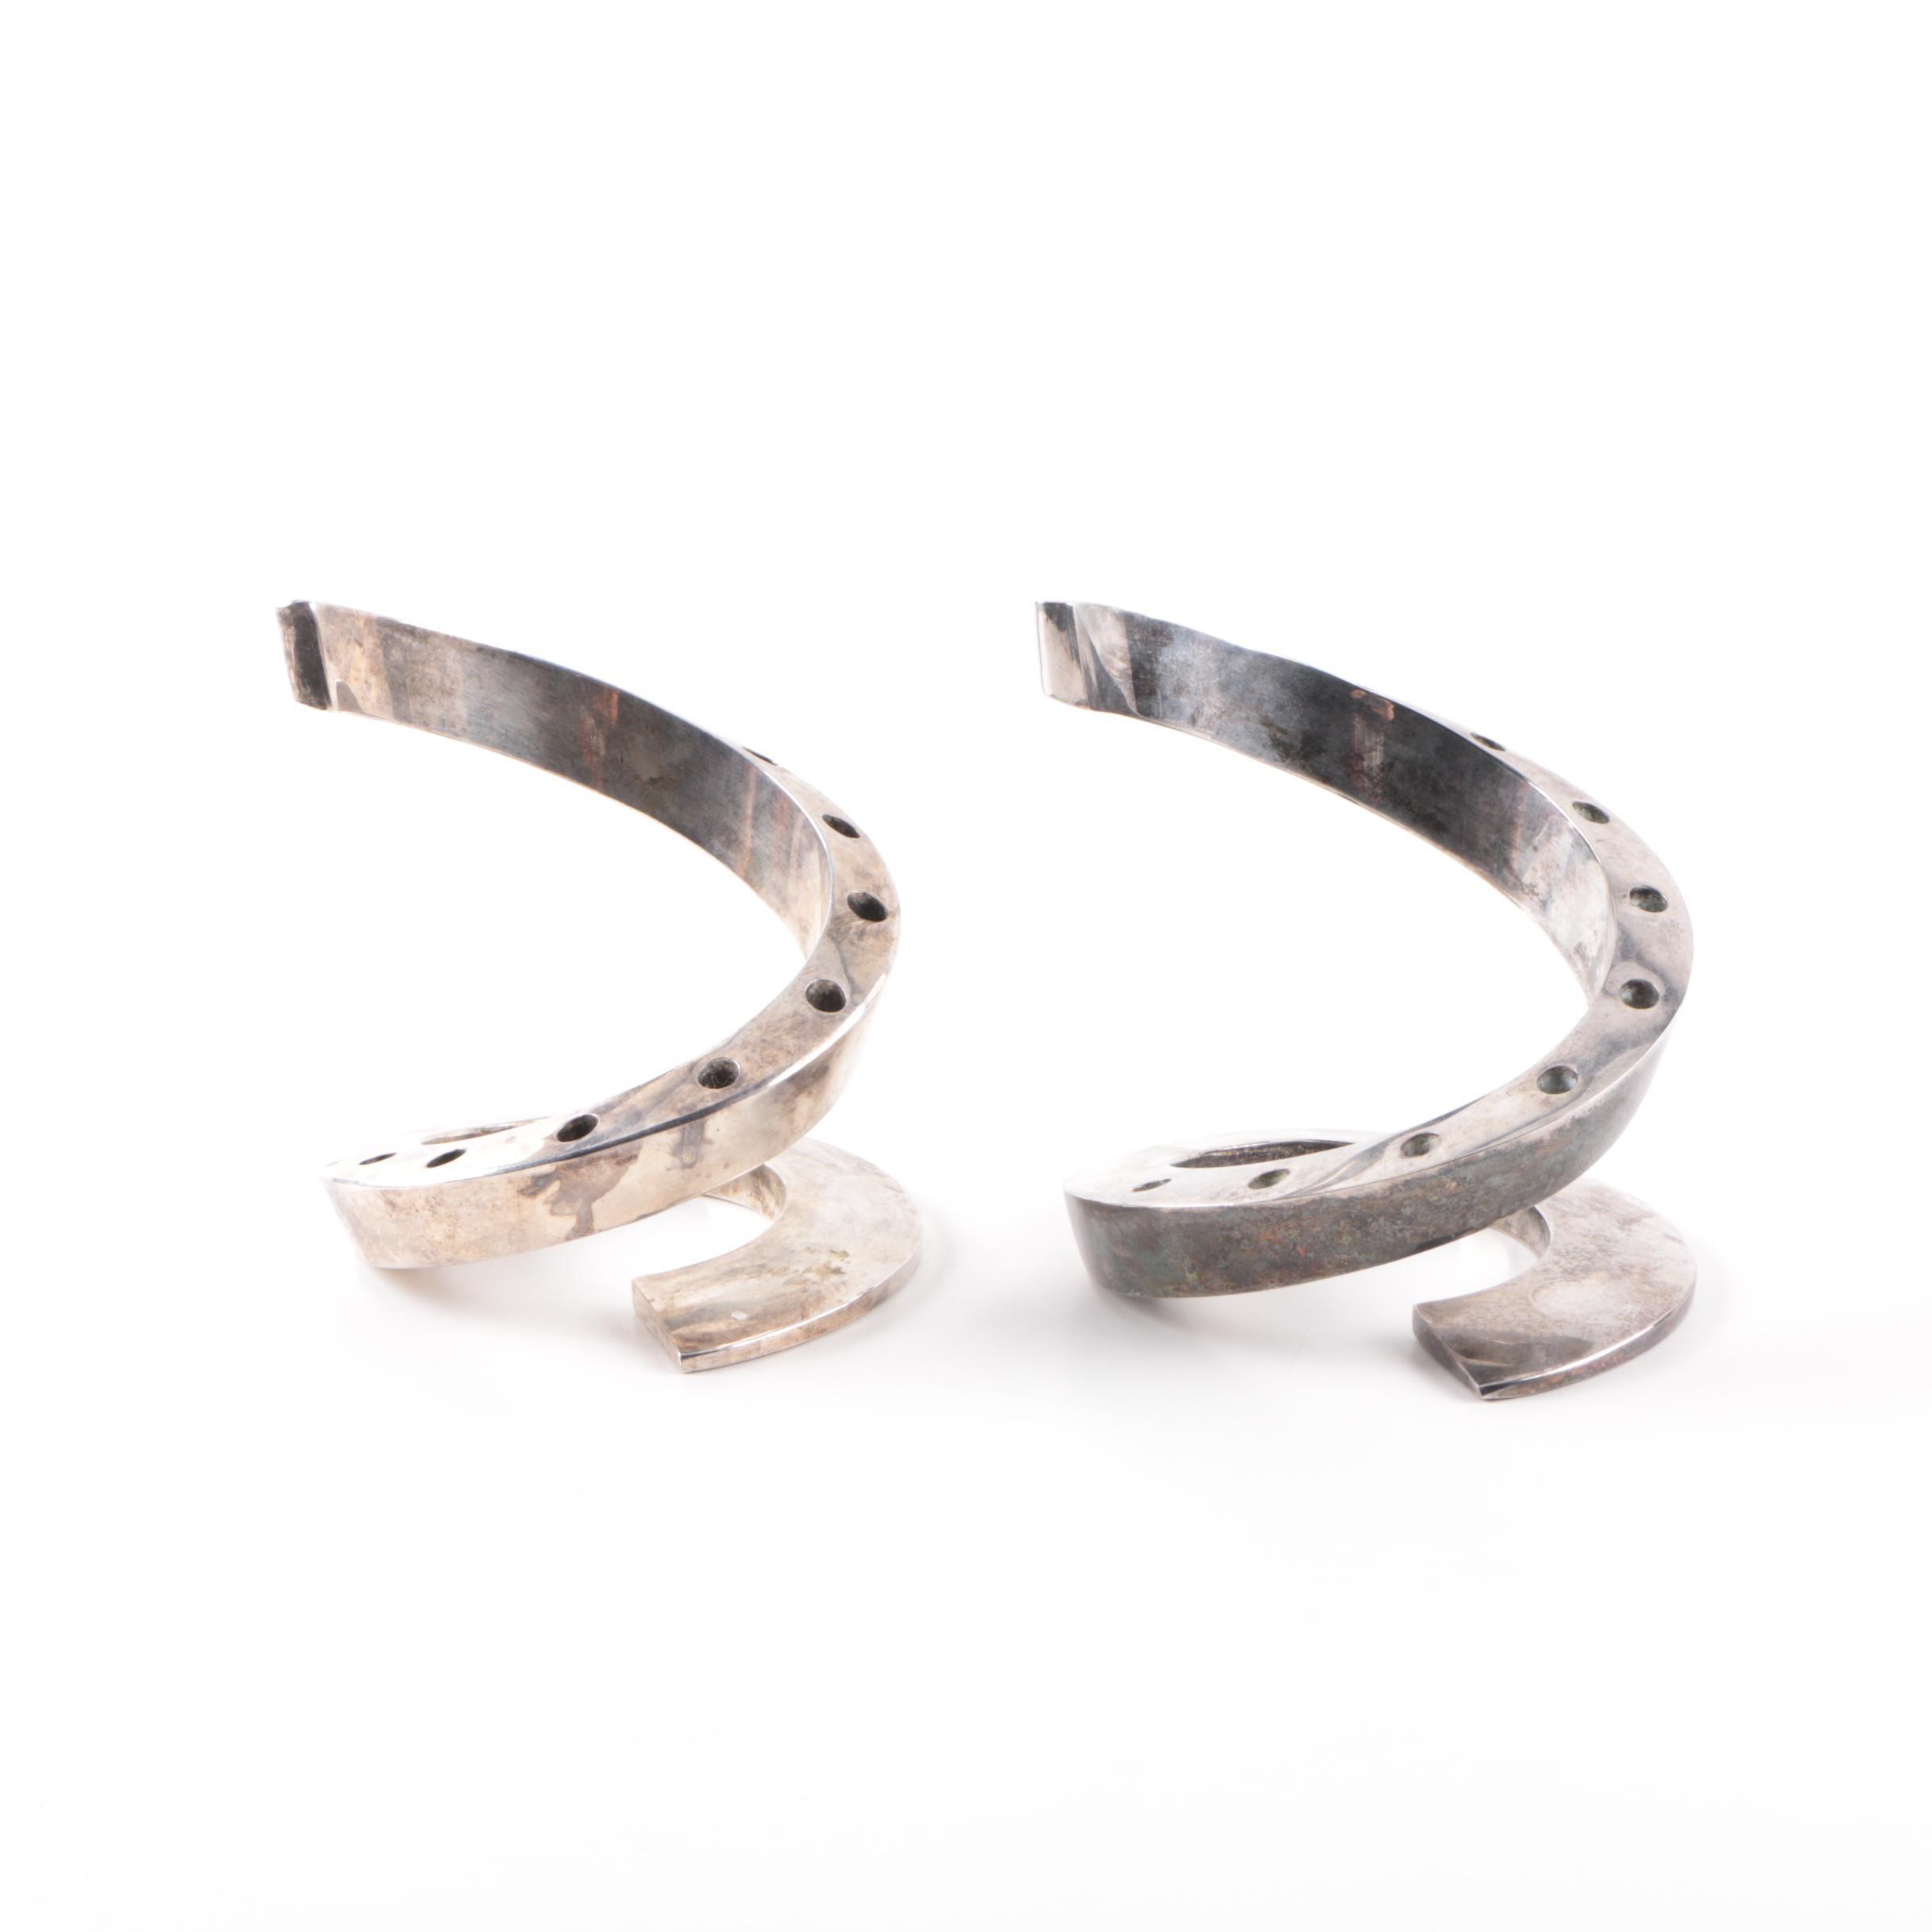 Dansk Mid Century Modern Bertil Vallien Spiral Silver Plate Candleholders